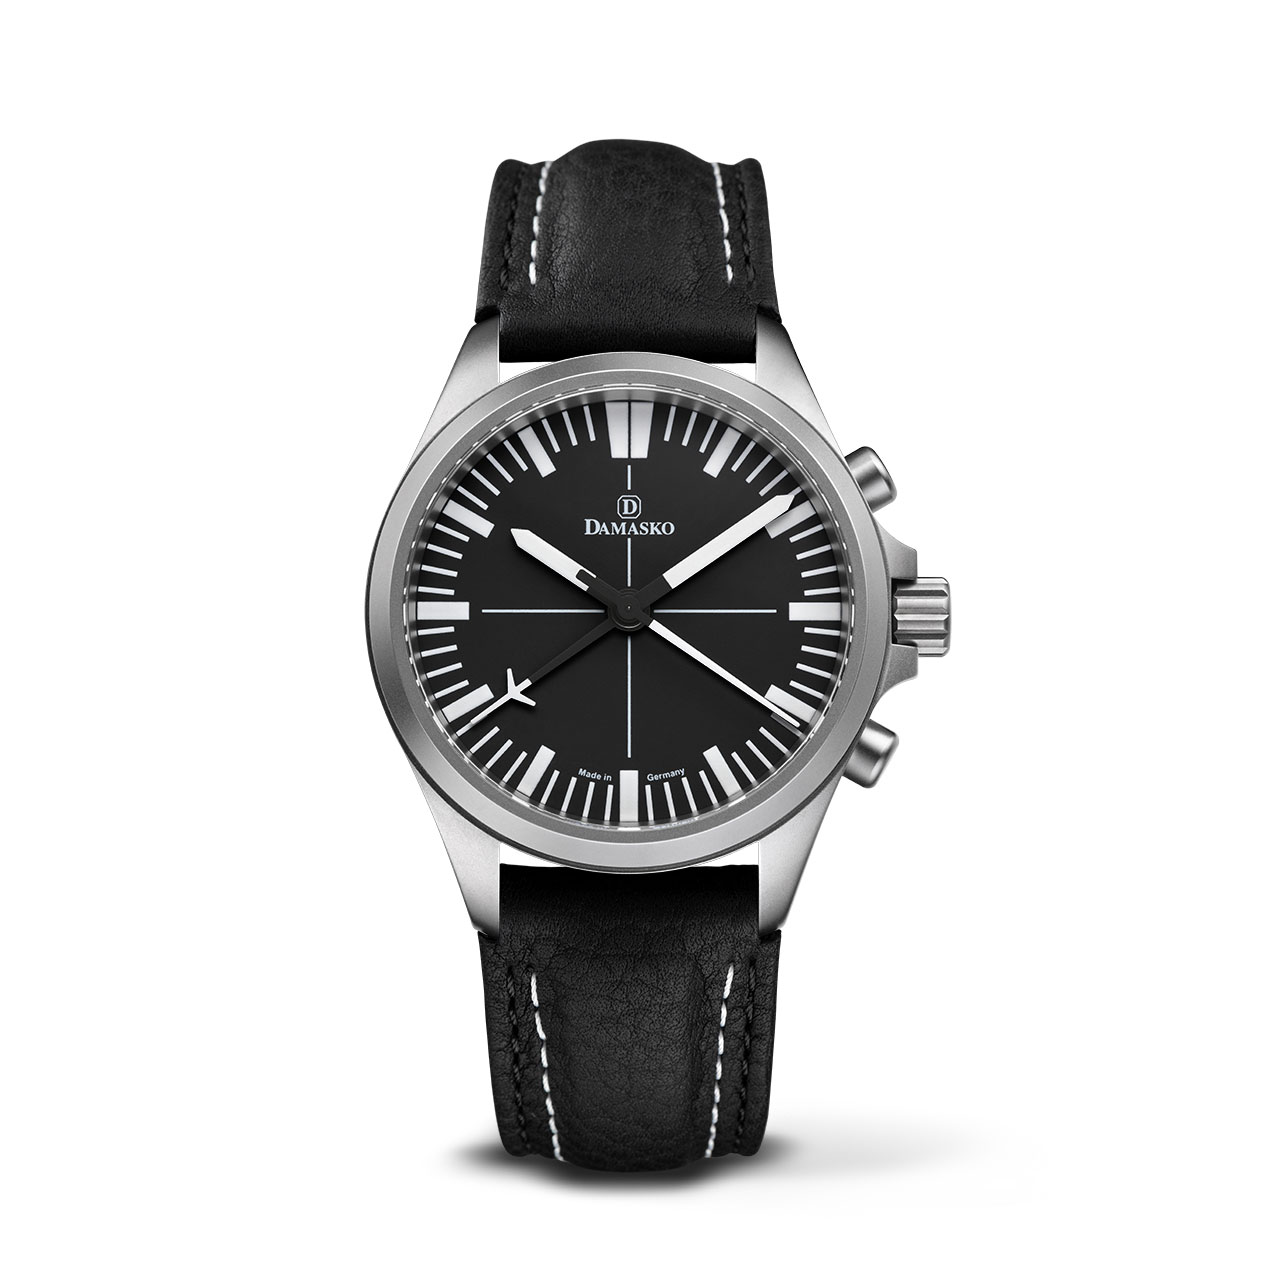 www.damasko-watches.com